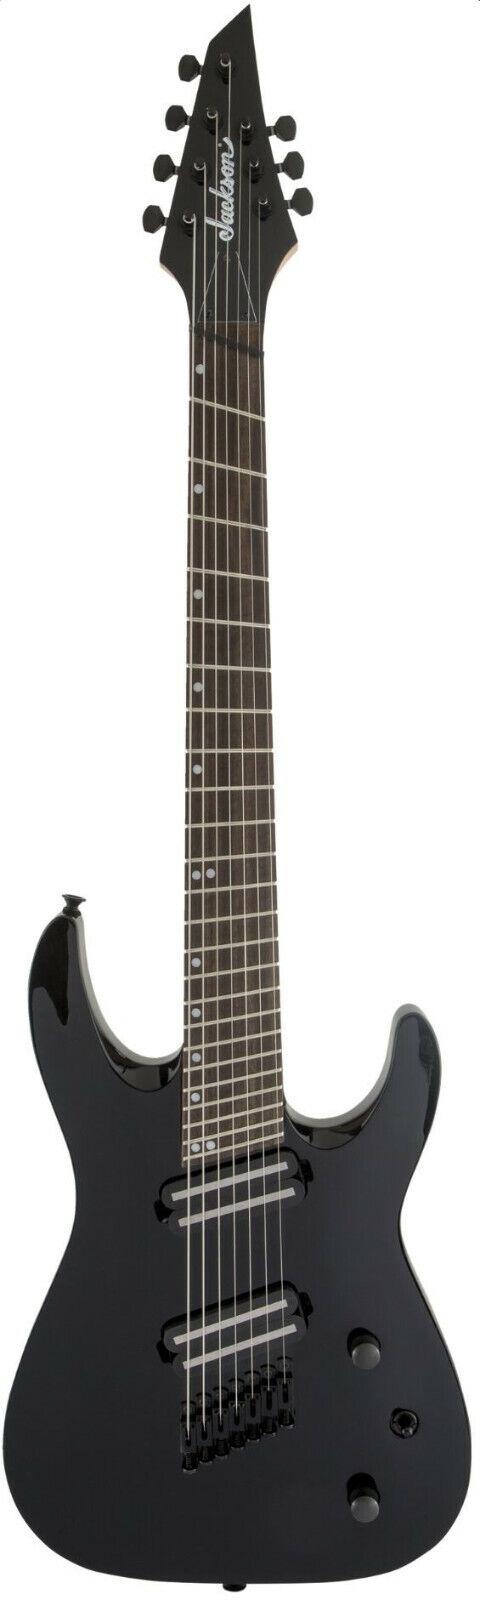 Jackson X-Series Dinky Arch Top DKAF7 MS, Laurel Fingerboard, Multi-Scale, GB